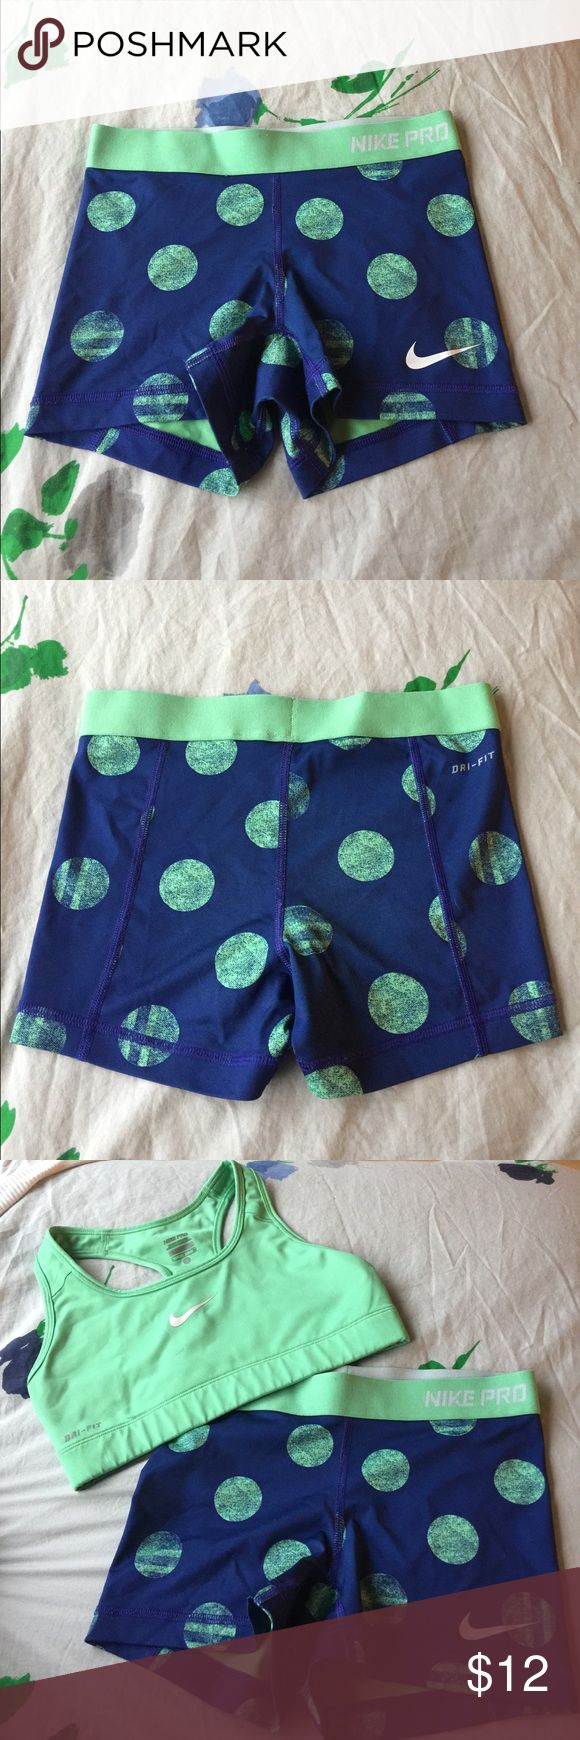 Polka Dot Nike Pro Combat Shorts Polka Dot Nike Pro Combat Shorts!   Bundle with Sports Bra for $7 discount! Nike Shorts